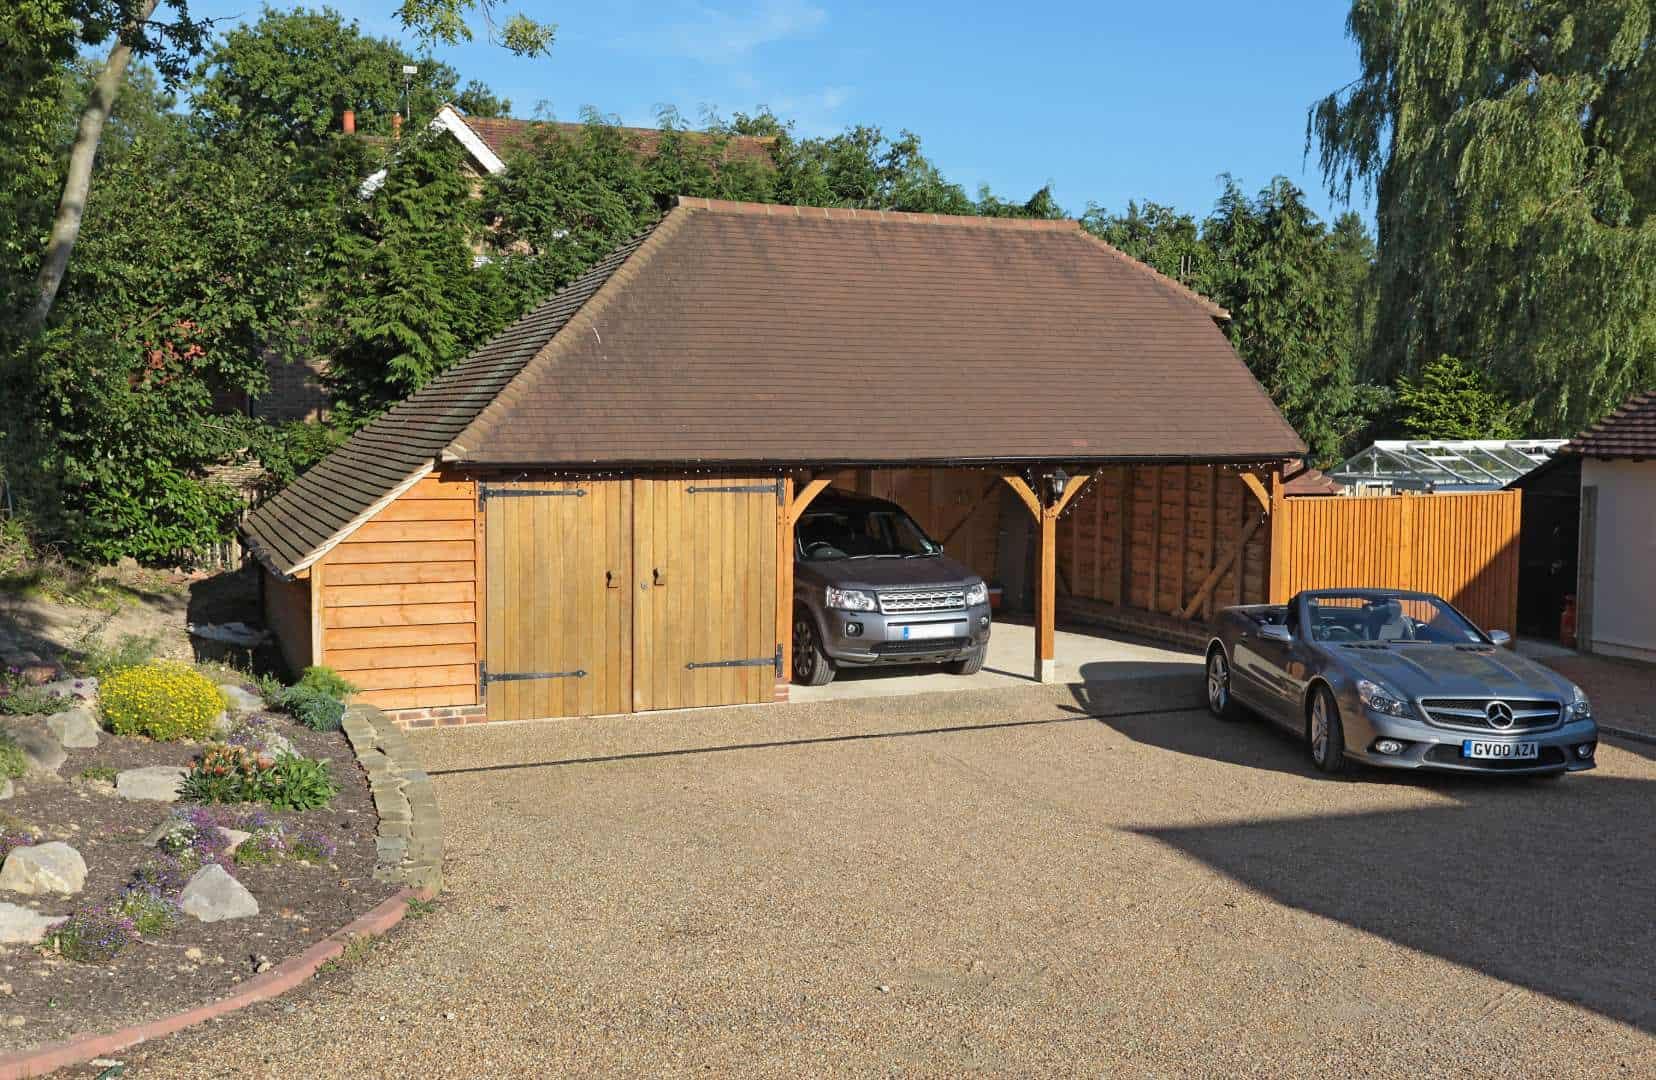 A 3 bay oak garage with luxury cars parked inside